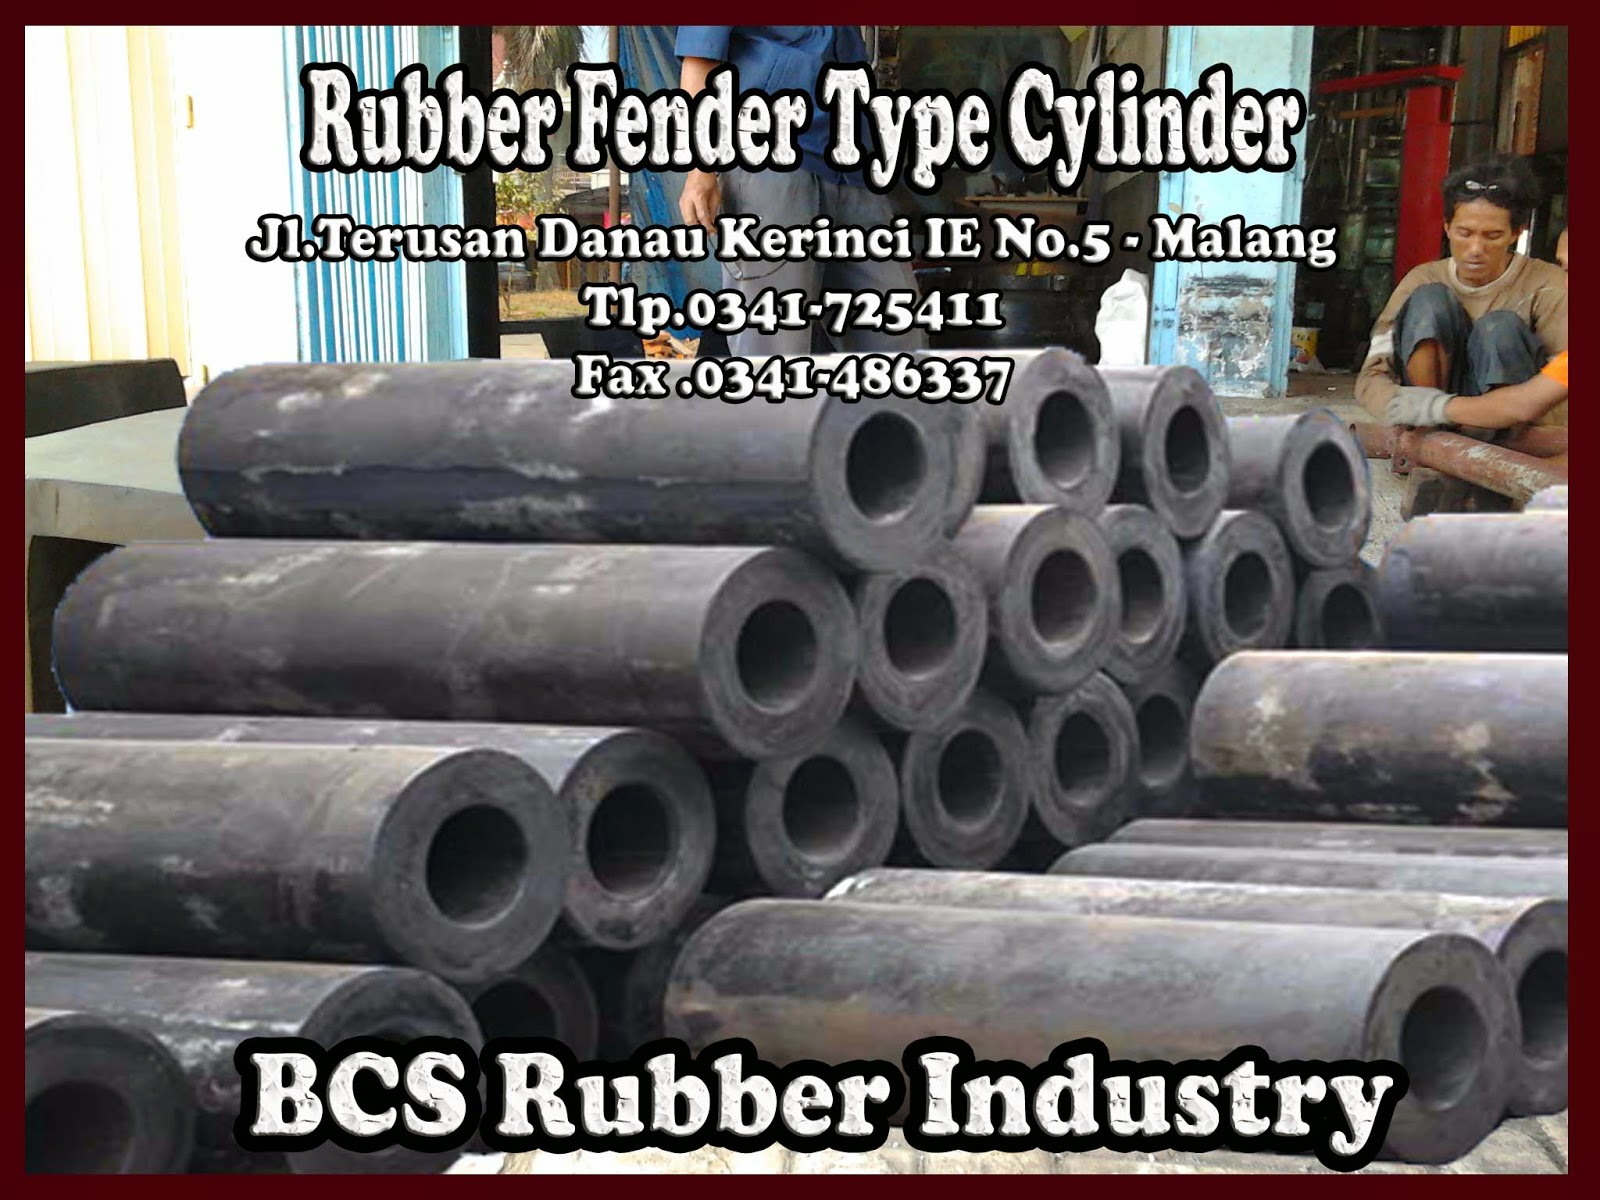 Rubber Fender , Rubber Fender Cylinder,Rubber Fender Type Cylinder, Rubber Fender Cylinder Dermaga , Rubber Fender Cylinder Kapal, Karet Rubber Fender Cylinder,Jual Karet rubber Fender Cylinder, Rubber Fender.karet Rubber Fender Cylinder.